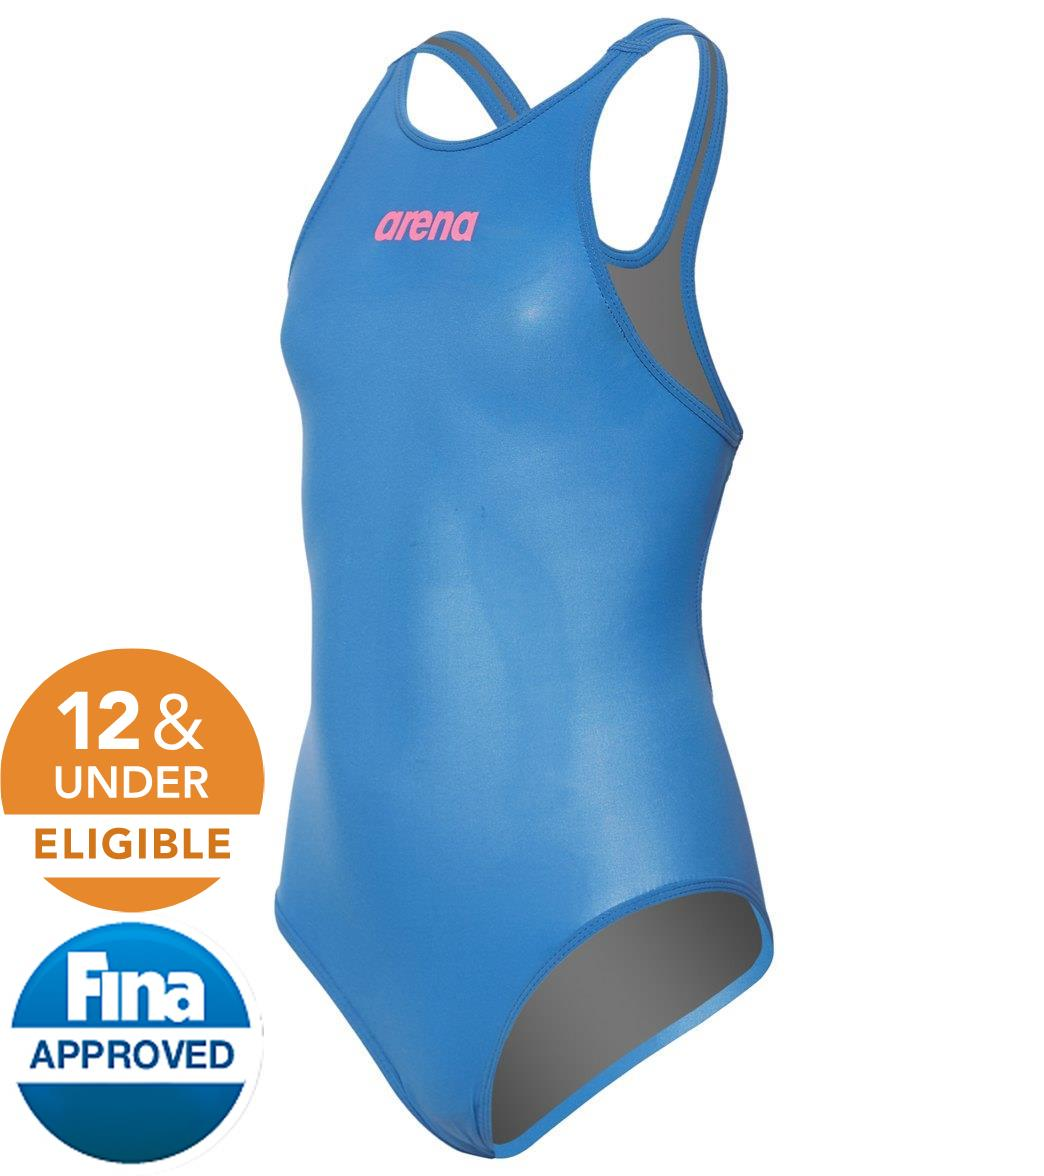 Arena Girls' Powerskin R-EVO Classic Tech Suit Swimsuit